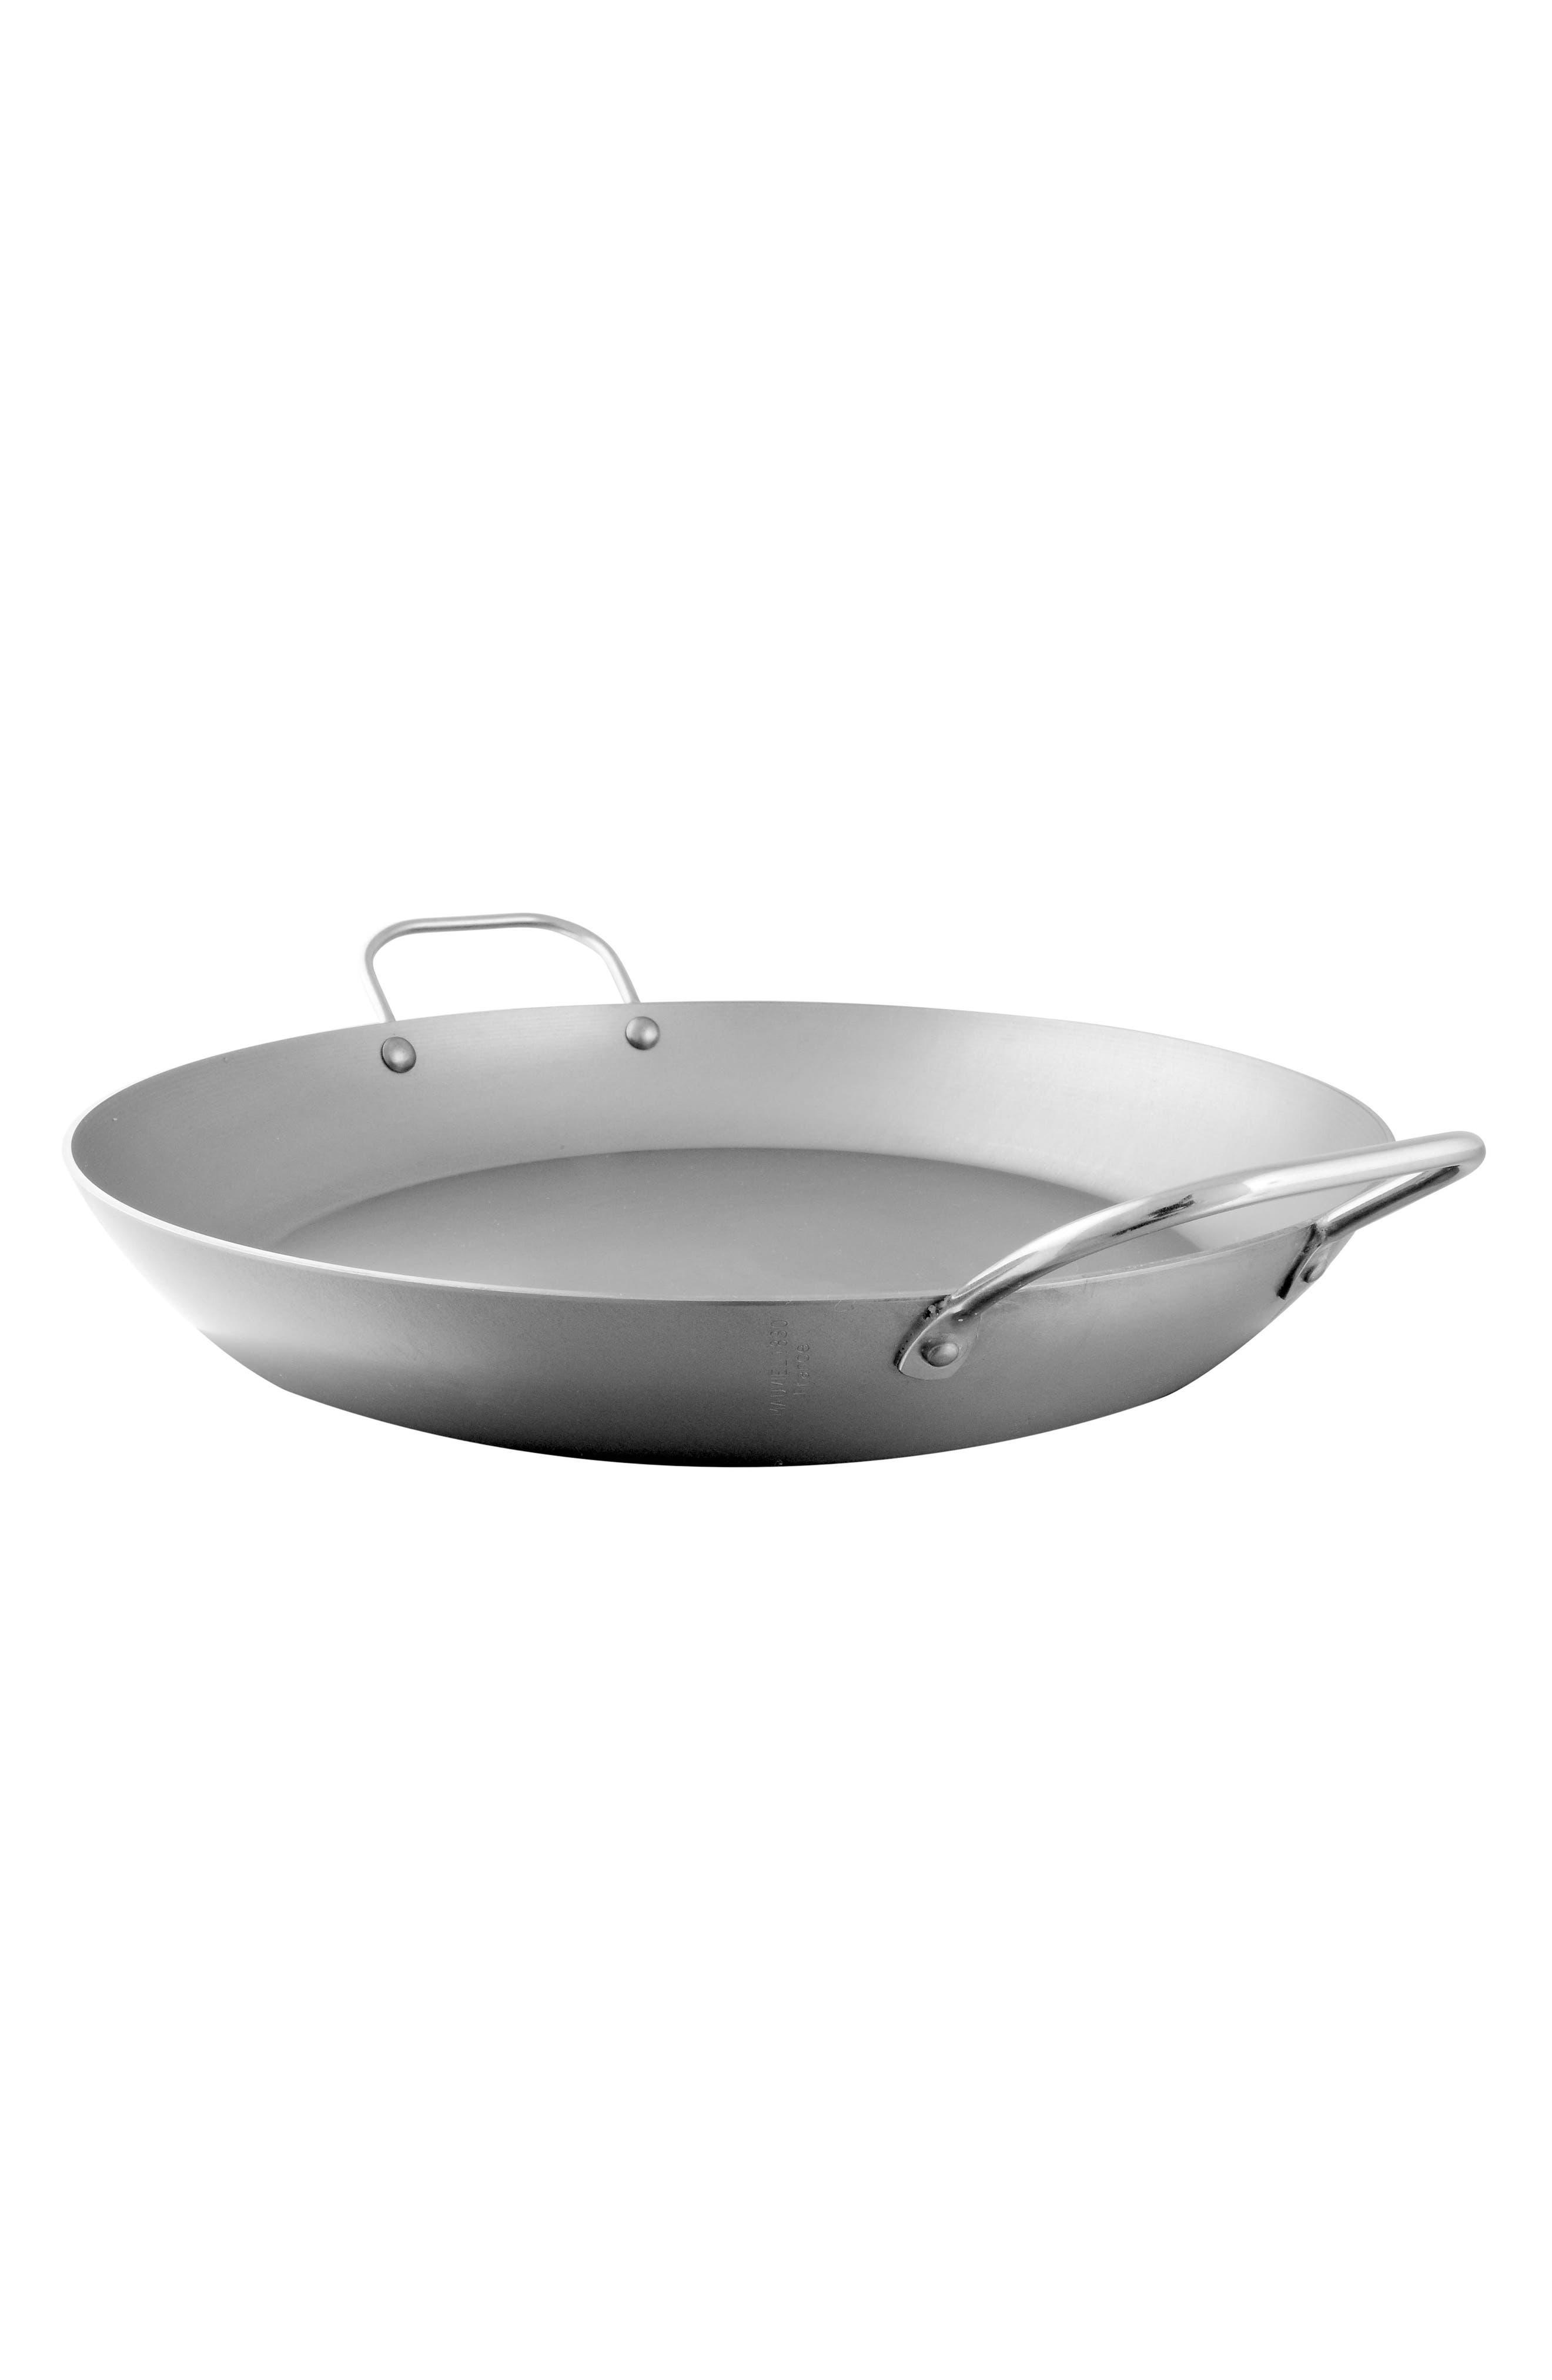 M'steel Carbon Steel Paella Pan,                             Main thumbnail 1, color,                             STEEL